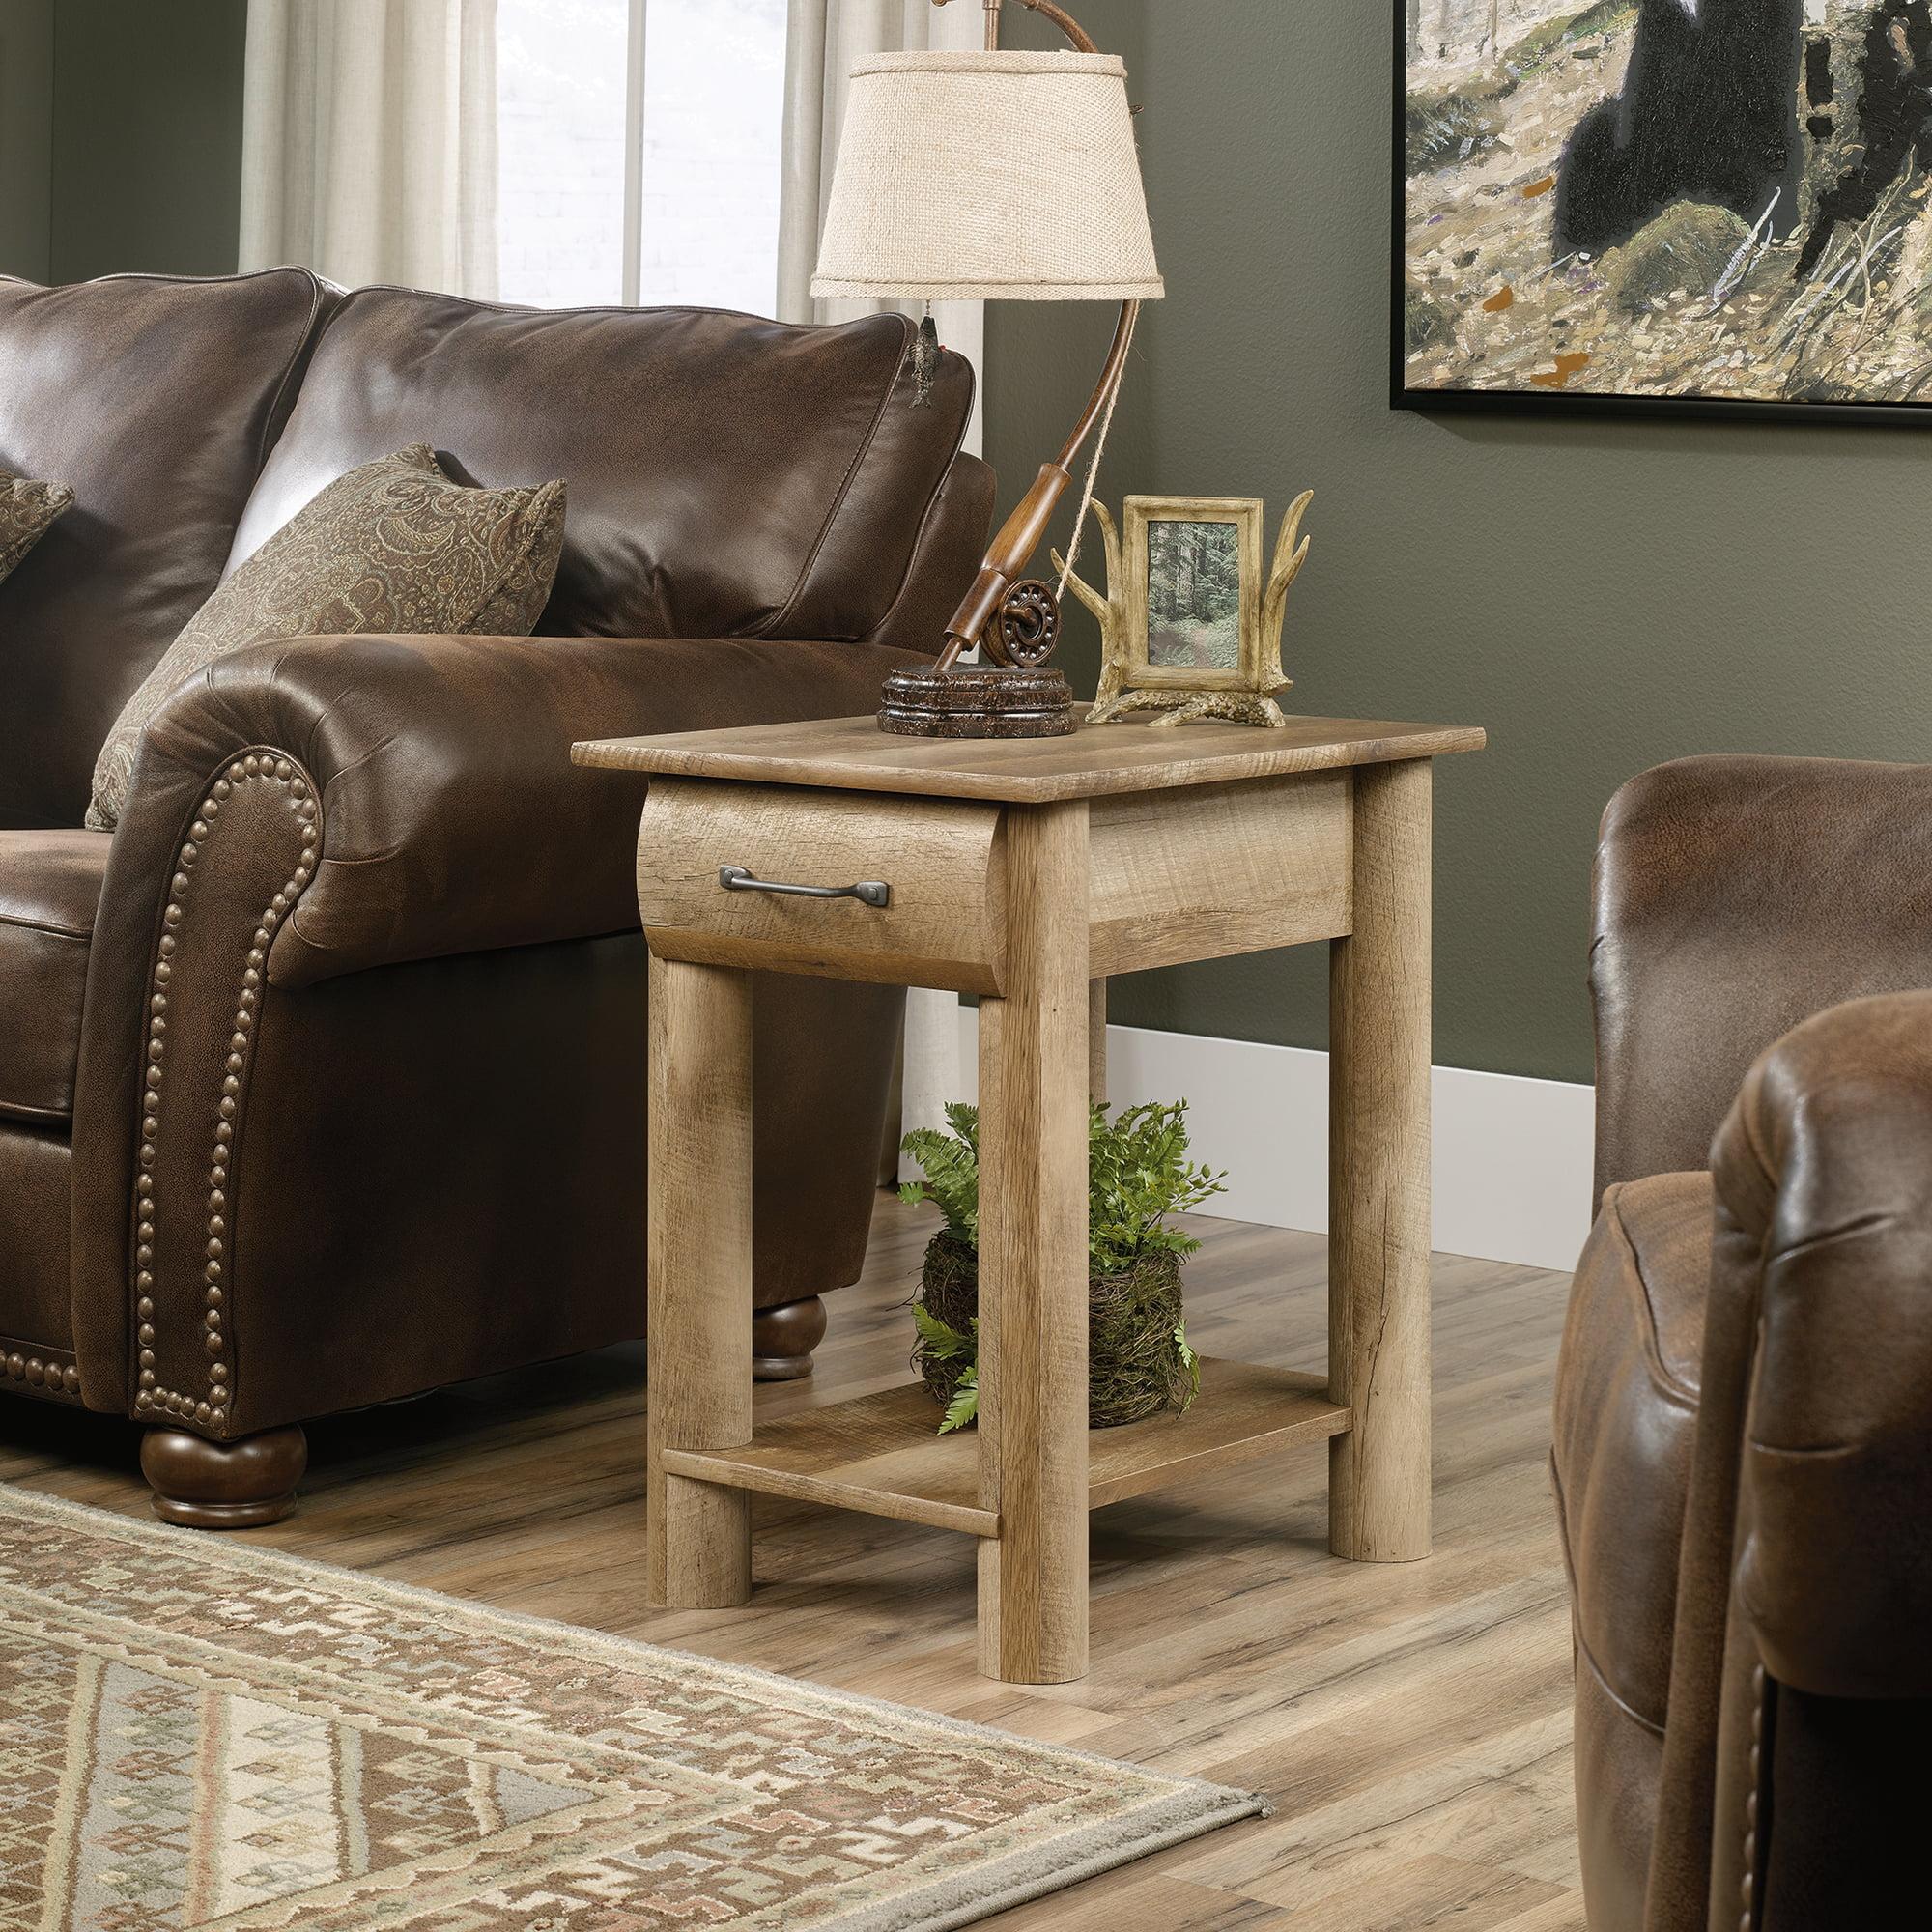 Sauder Boone Mountain Side Table, Craftsman Oak Finish   Walmart.com